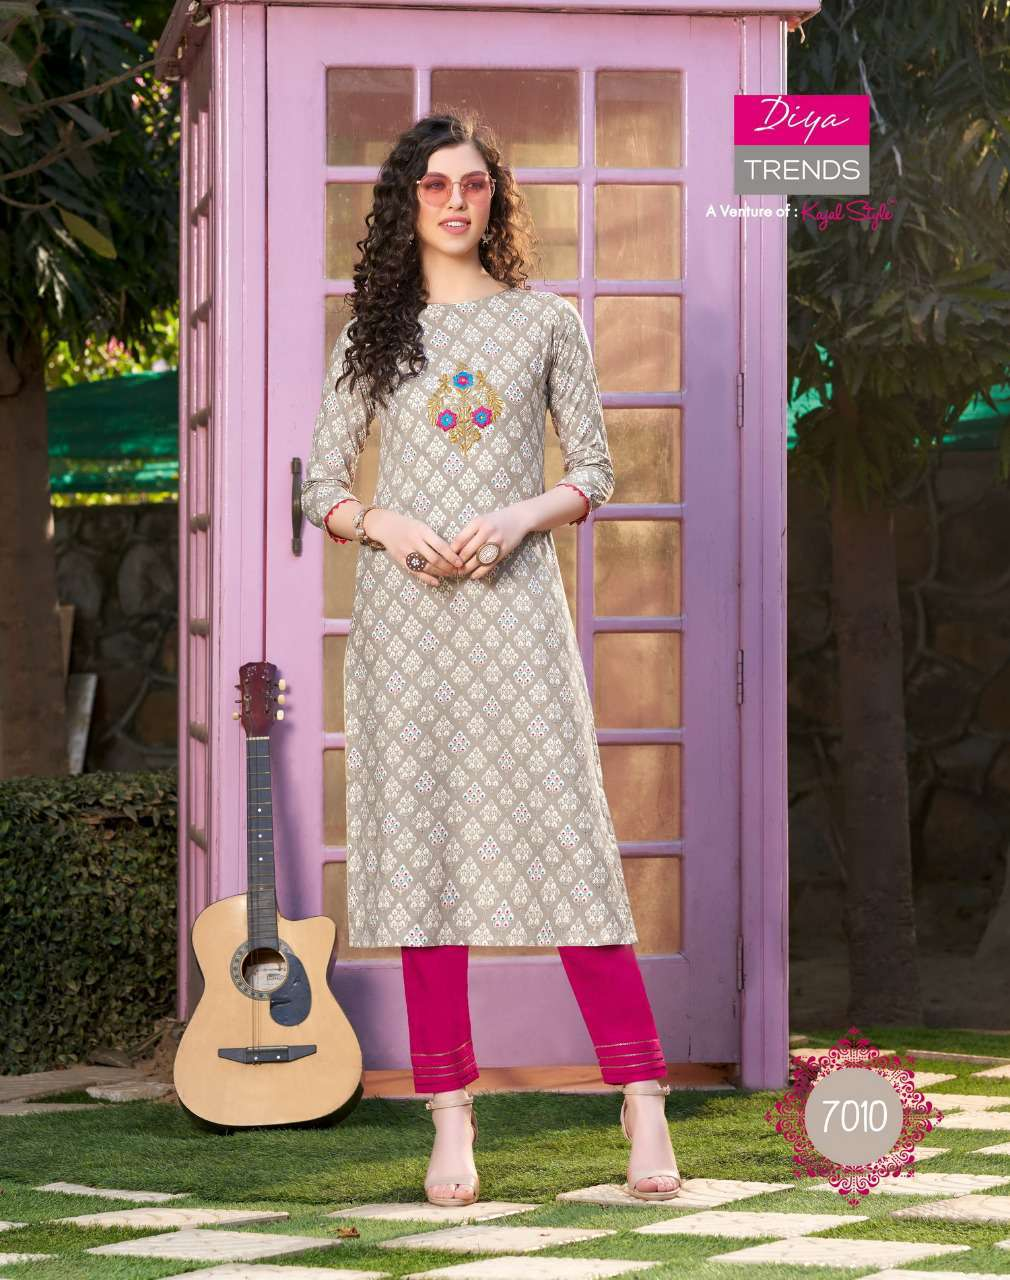 Diya Trends Bibas Vol 7 by Kajal Style Kurti with Palazzo Pant Wholesale Catalog 14 Pcs 13 - Diya Trends Biba's Vol 7 by Kajal Style Kurti with Palazzo Pant Wholesale Catalog 14 Pcs